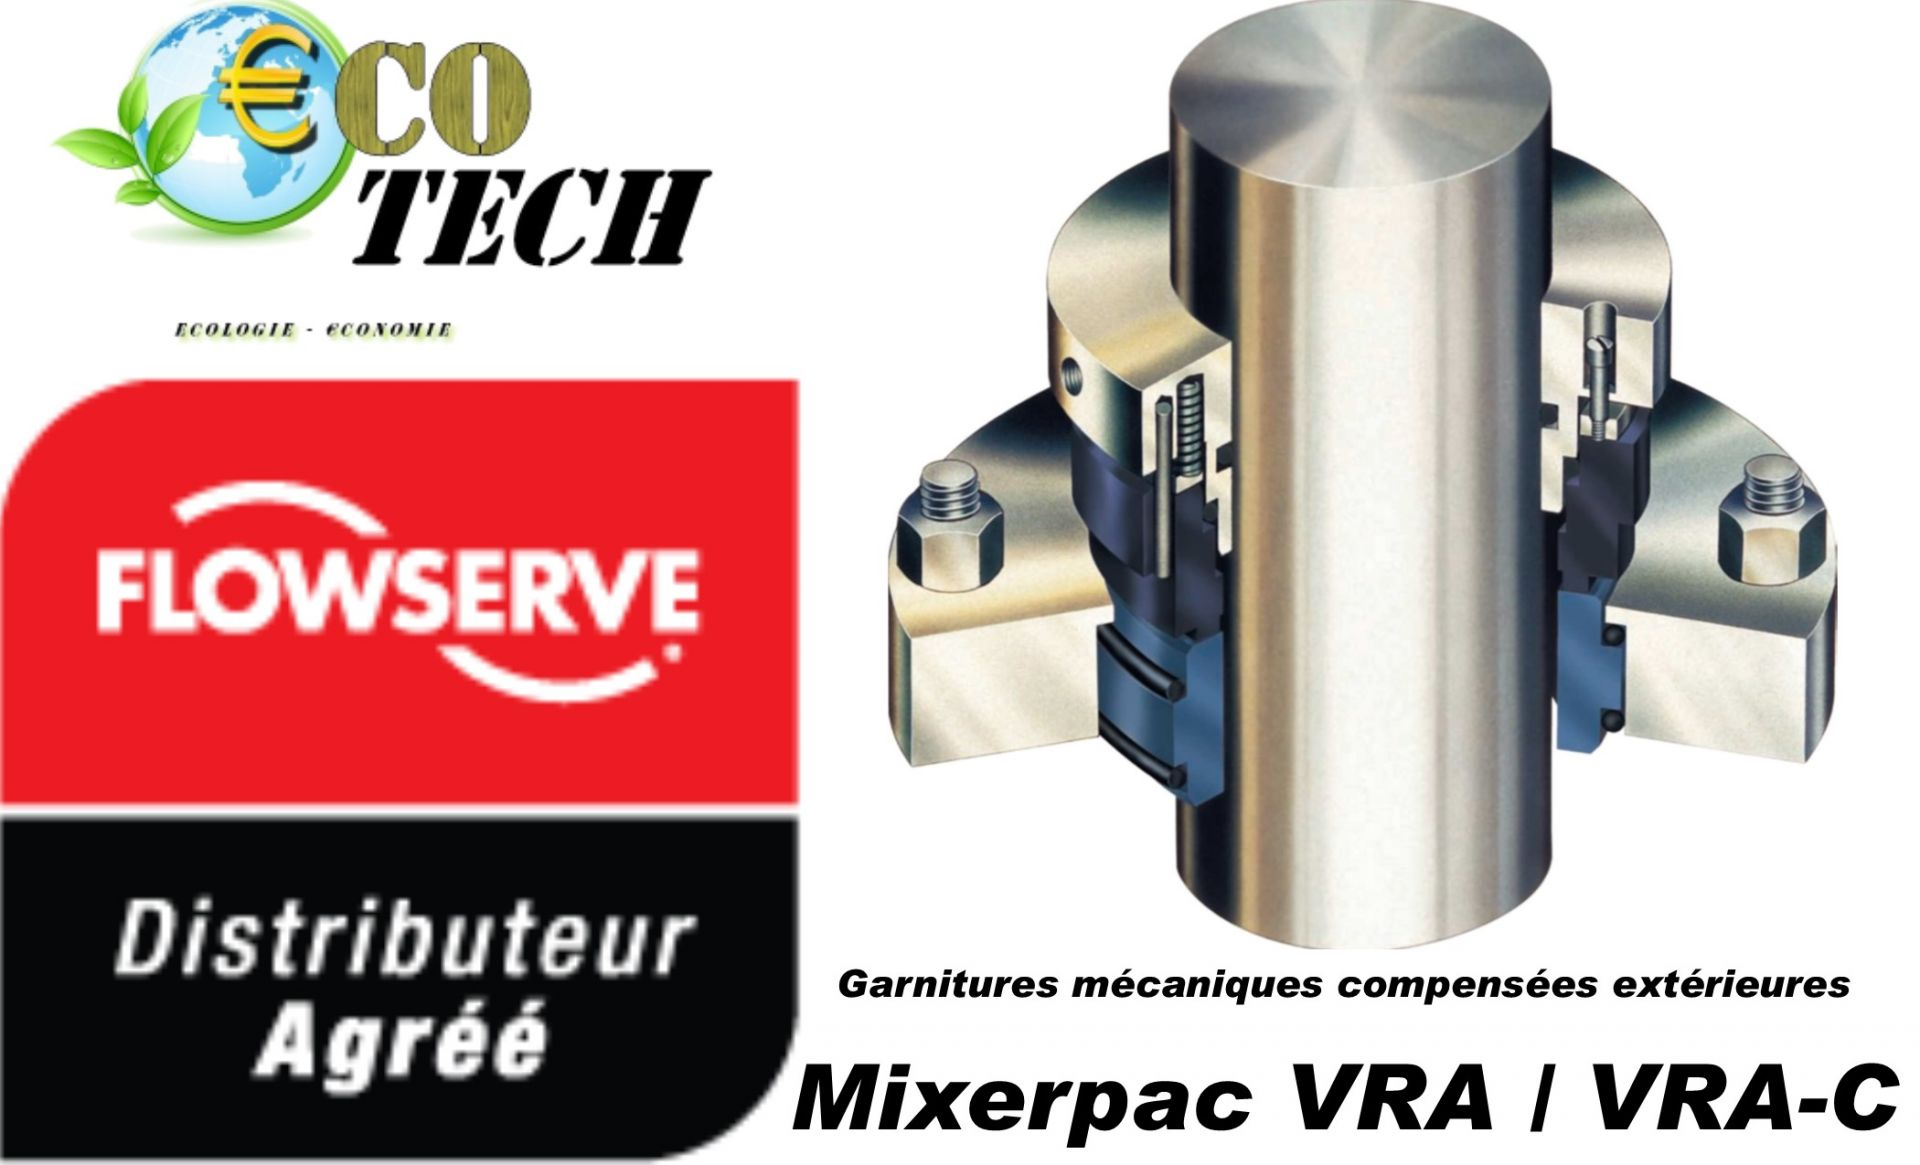 Garniture mécanique flowserve  mixerpac vra / vra-c